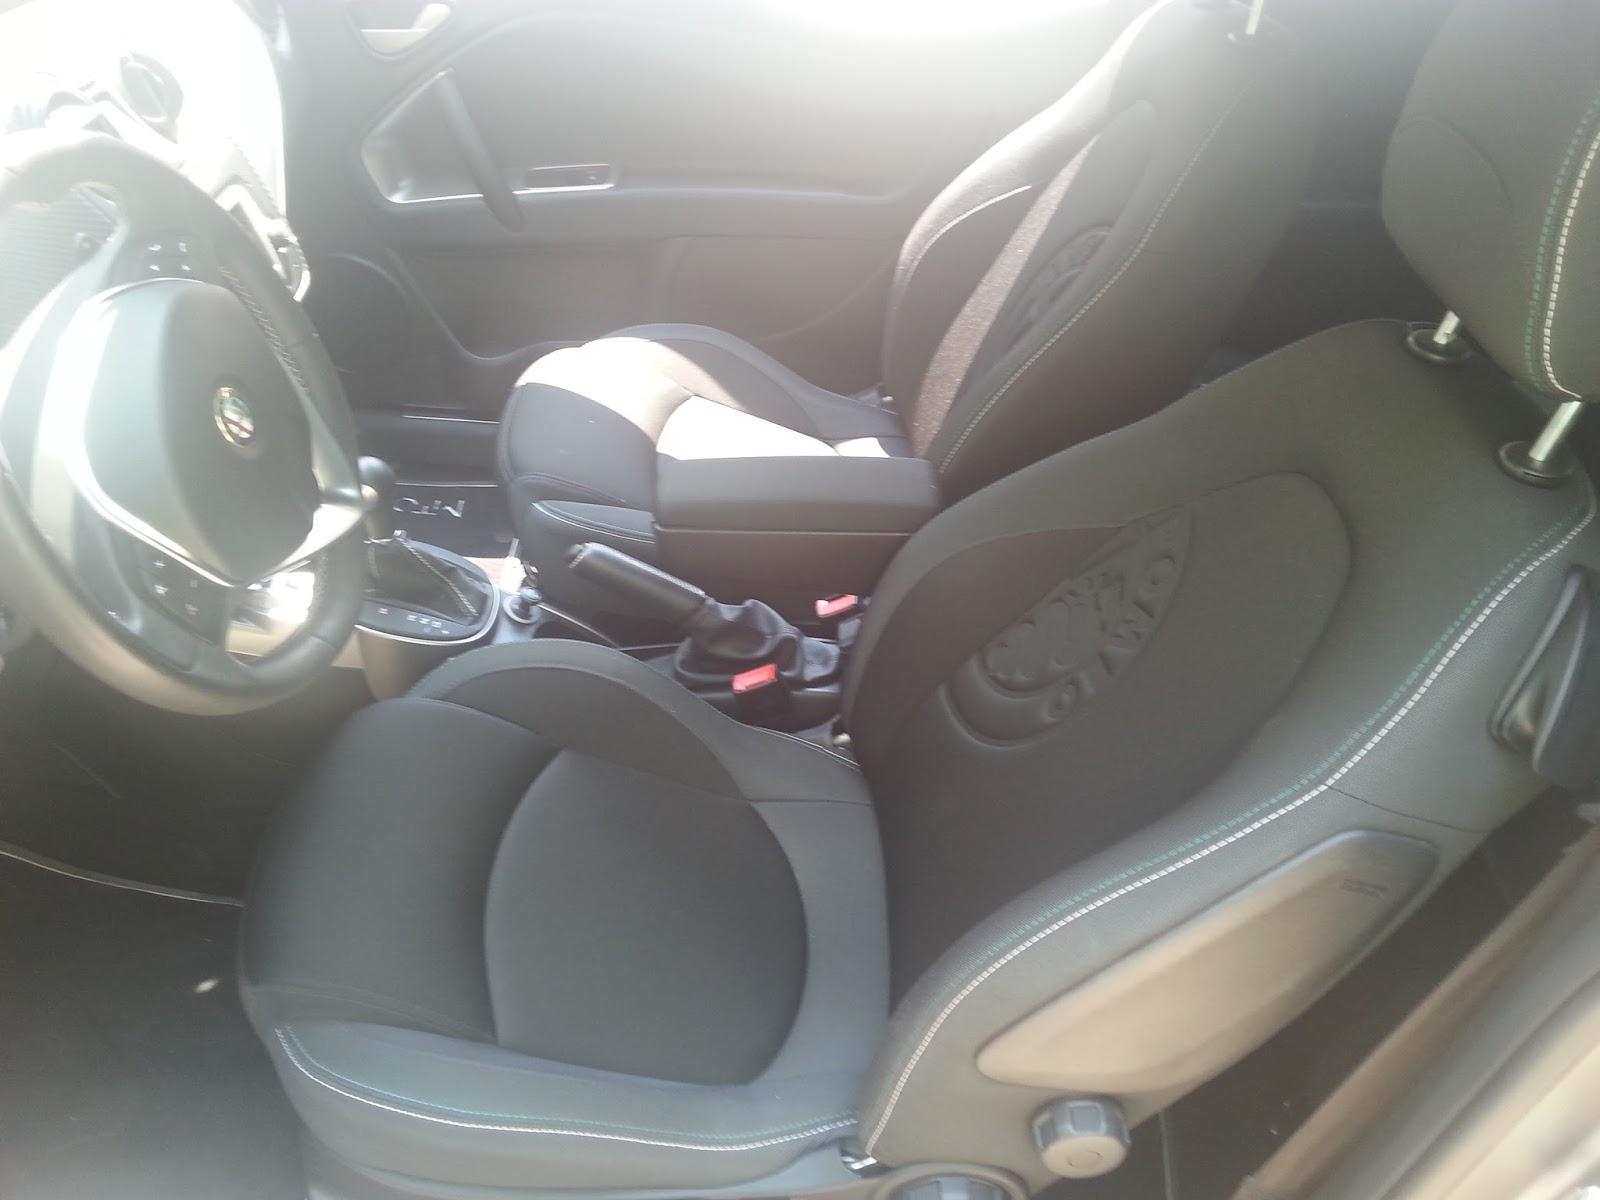 F4 Όταν έλιωσα στο στρίψιμο μια MiTo QV alfa romeo, Alfa Romeo MiTo QV, MiTo QV, zblog, ΔΟΚΙΜΕΣ